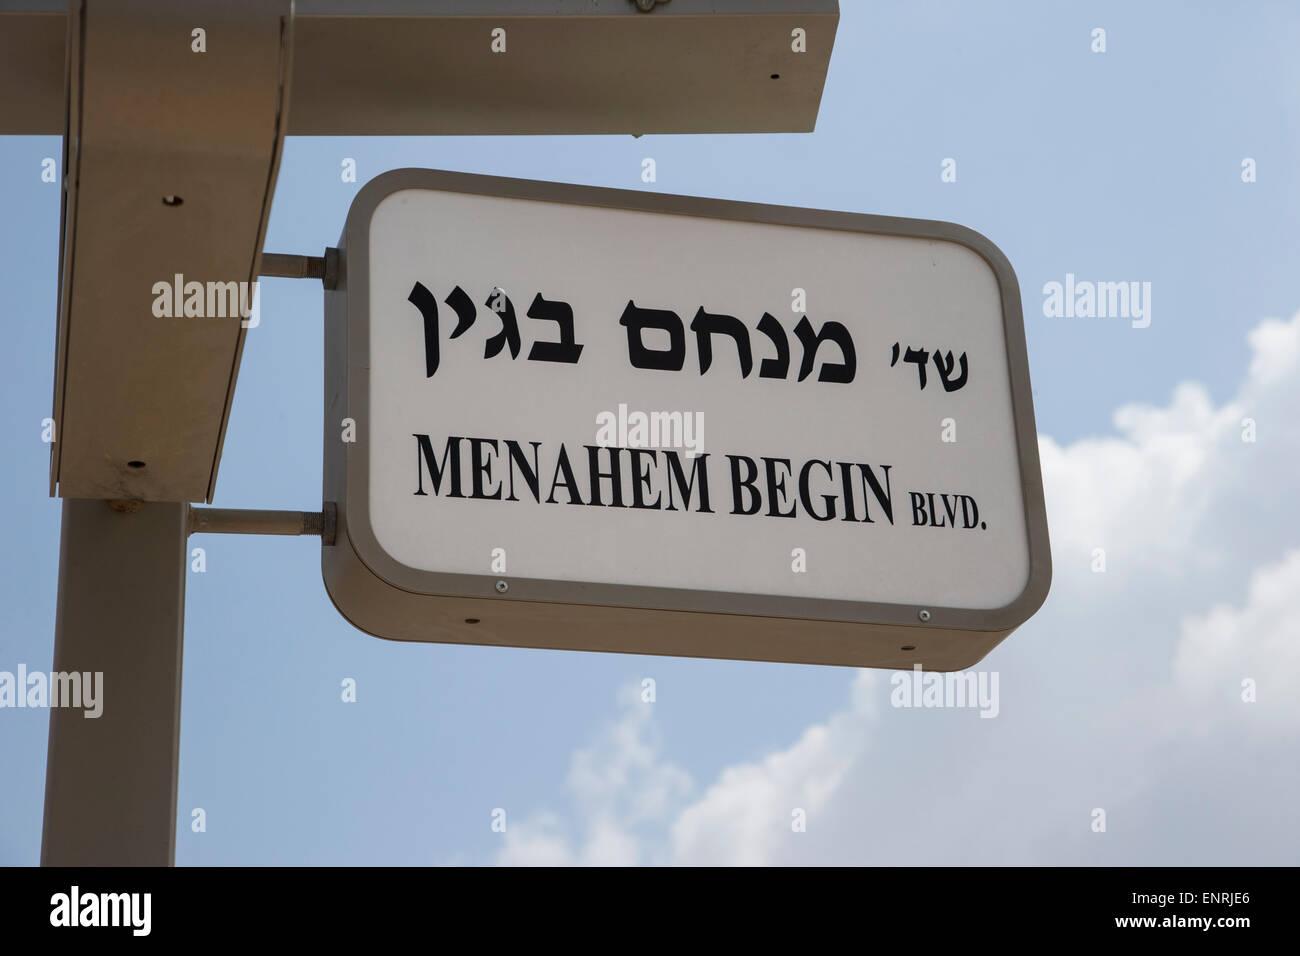 Menahem Begin boulevard Street sign in Ashdod Israel - Stock Image